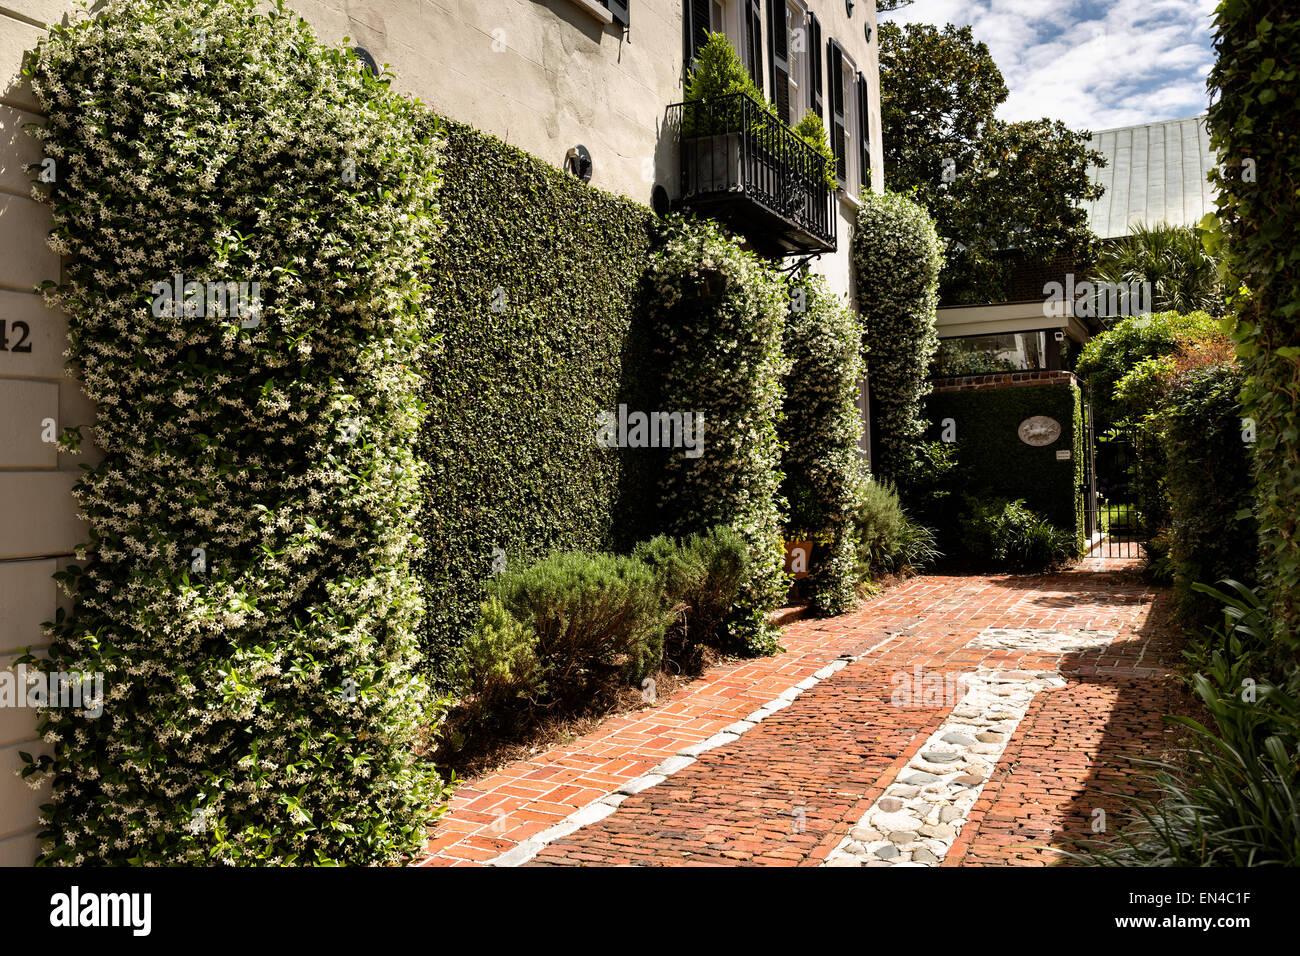 Brick Driveway Stock Photos & Brick Driveway Stock Images - Alamy